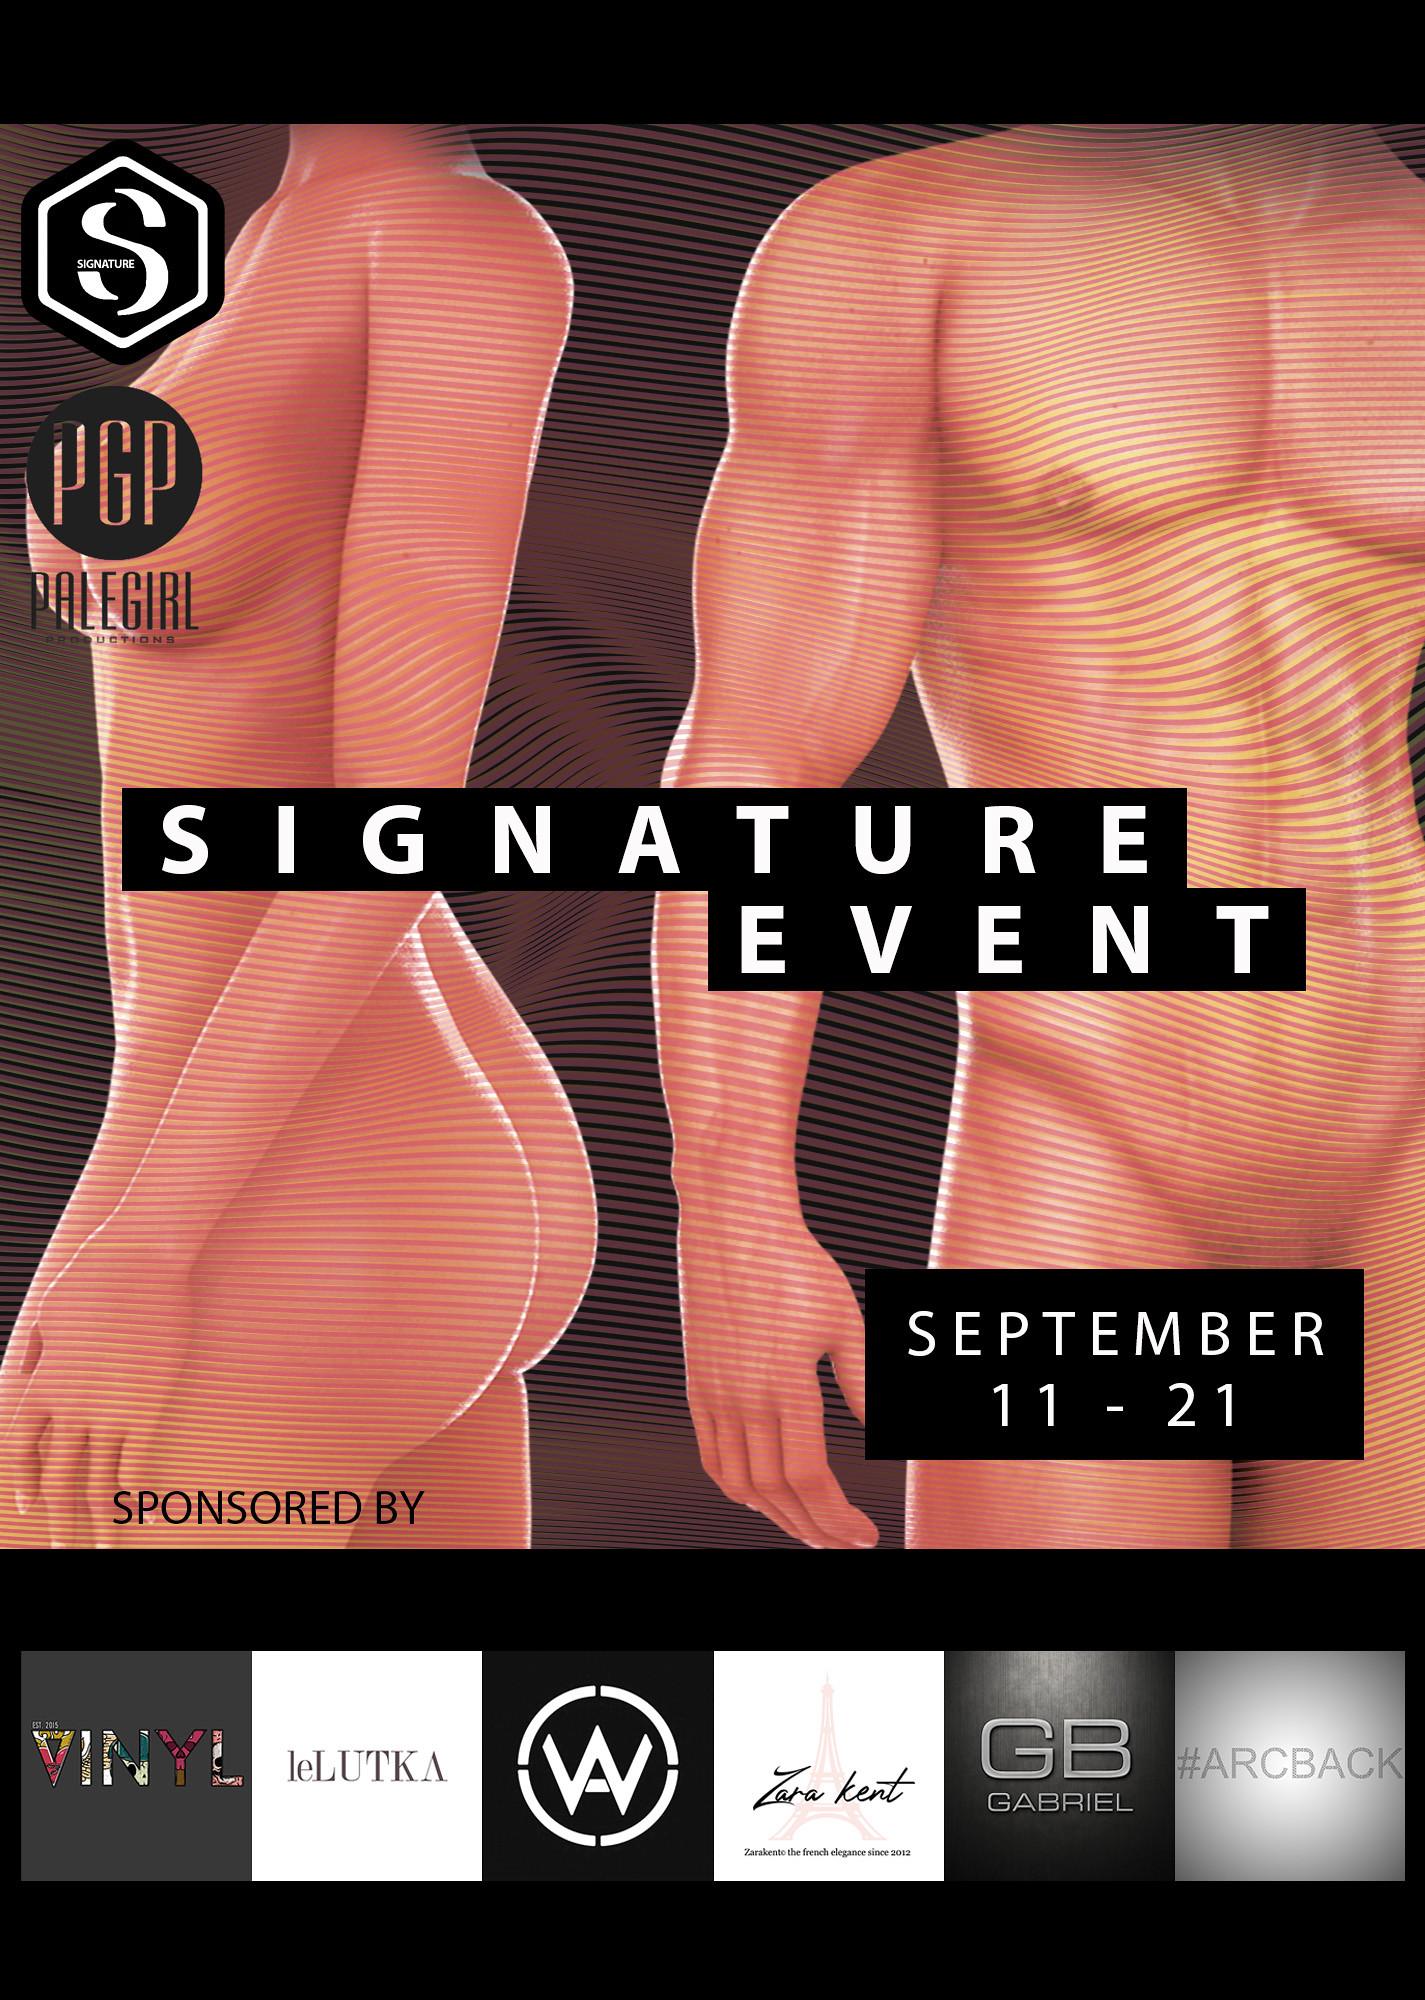 Signature_Body_Event Sptember 11 - 21